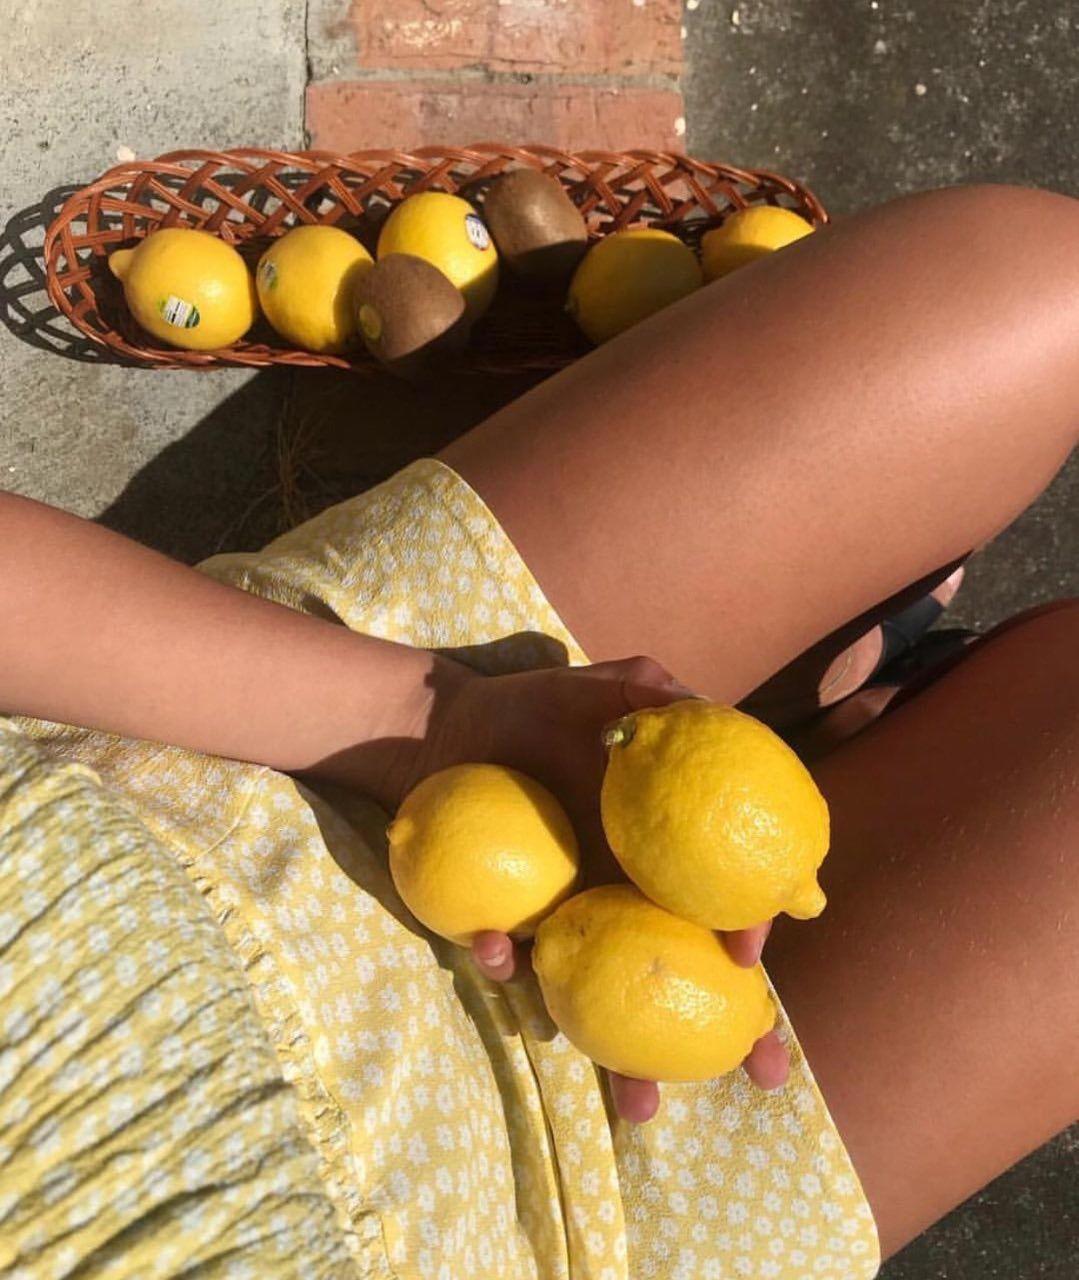 Pin by reem on SPRING Lemon nutrition, Lemon health